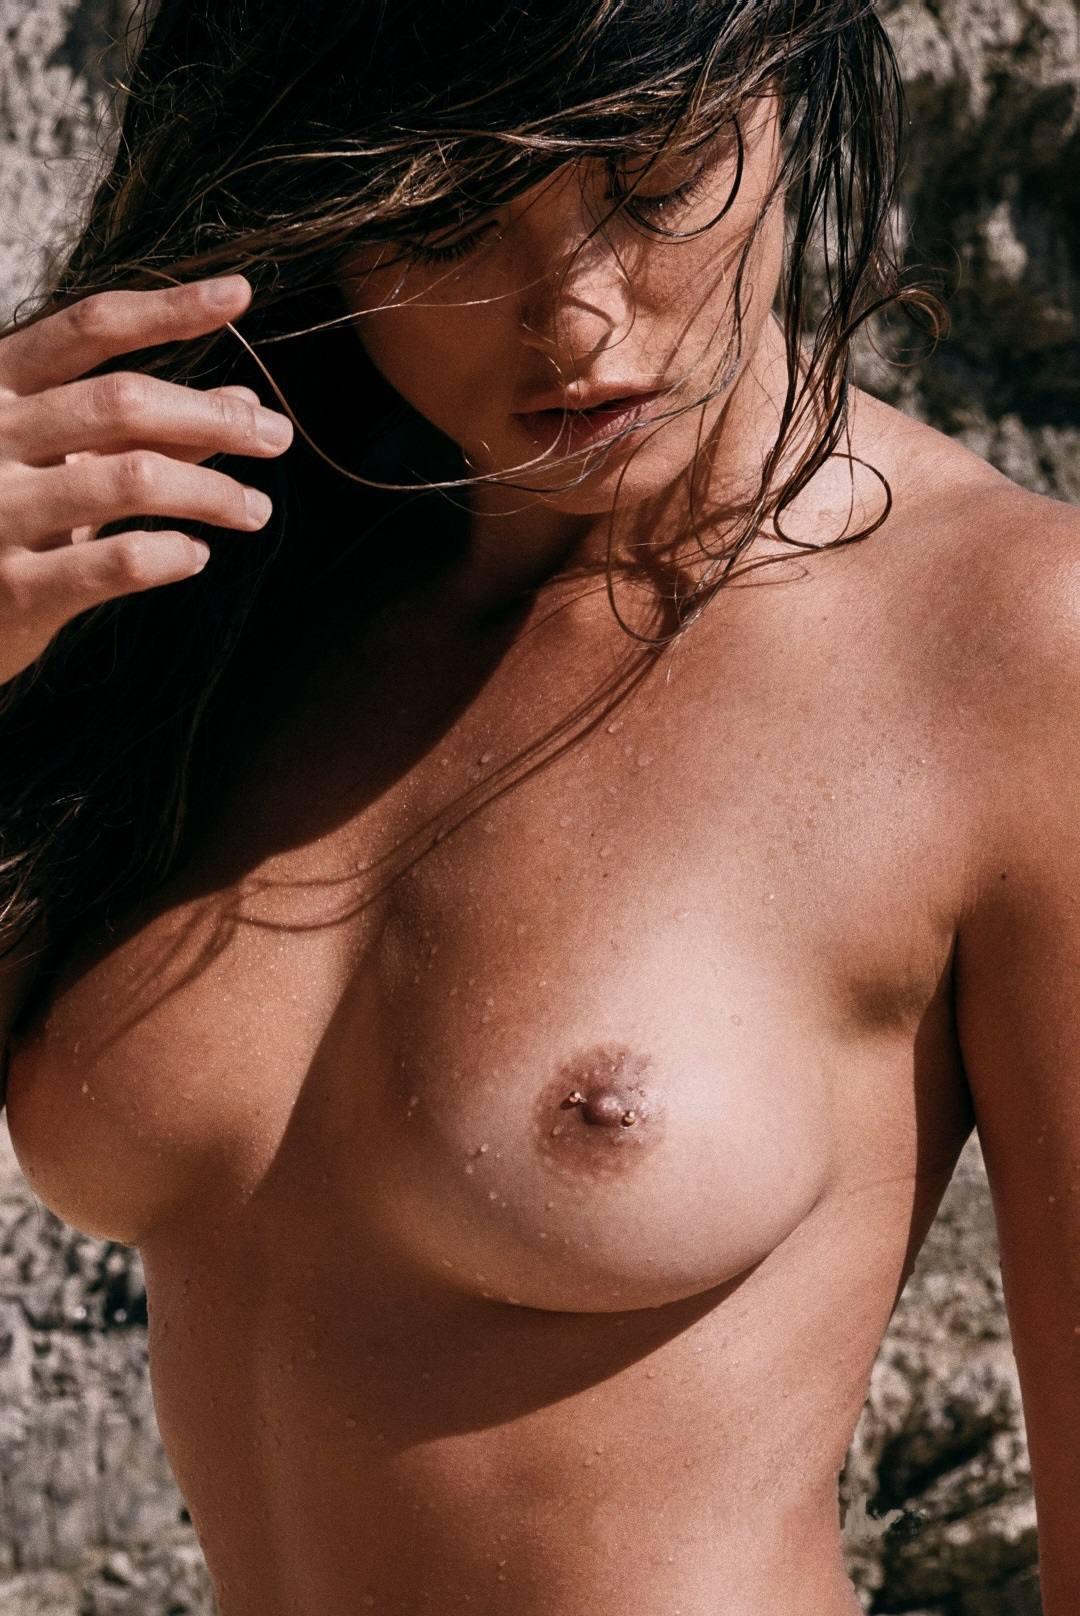 Cherokee Luker – Sexy Boobs In Beautiful Topless Photoshoot By Josh Ryan (nsfw) 0008